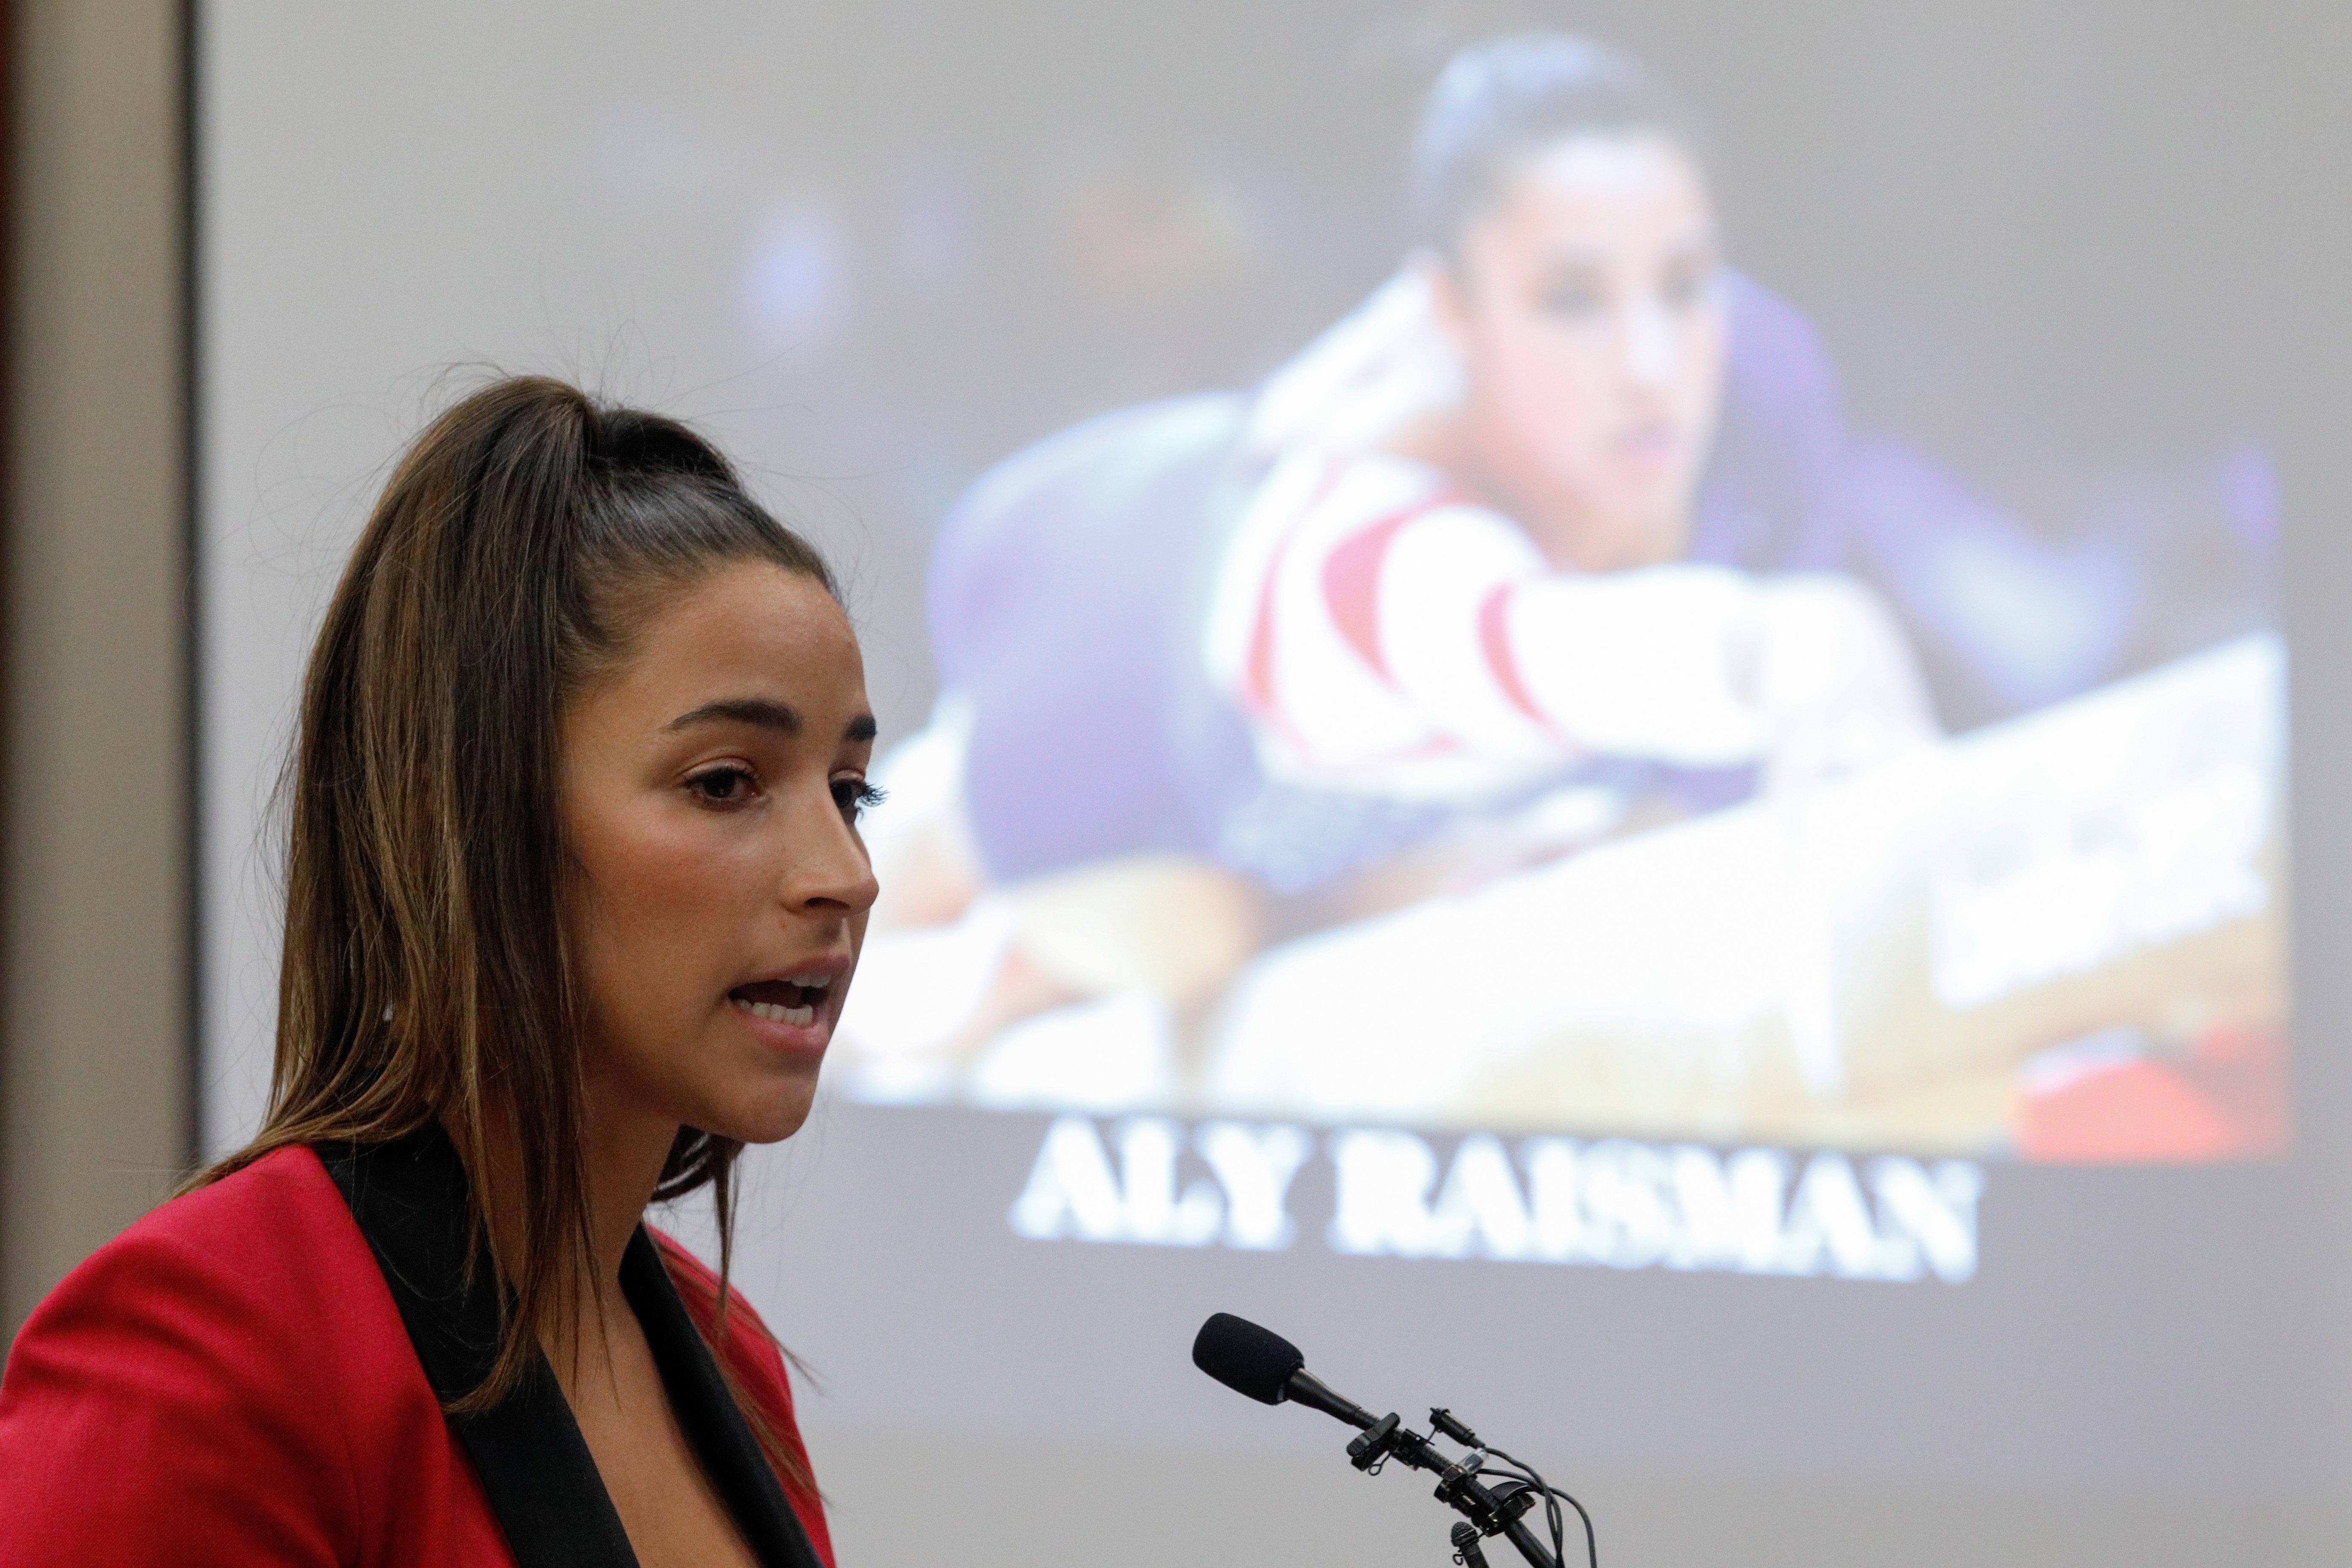 Olympic gymnast Aly Raisman sues USOC, USA Gymnastics over Larry Nassar abuse